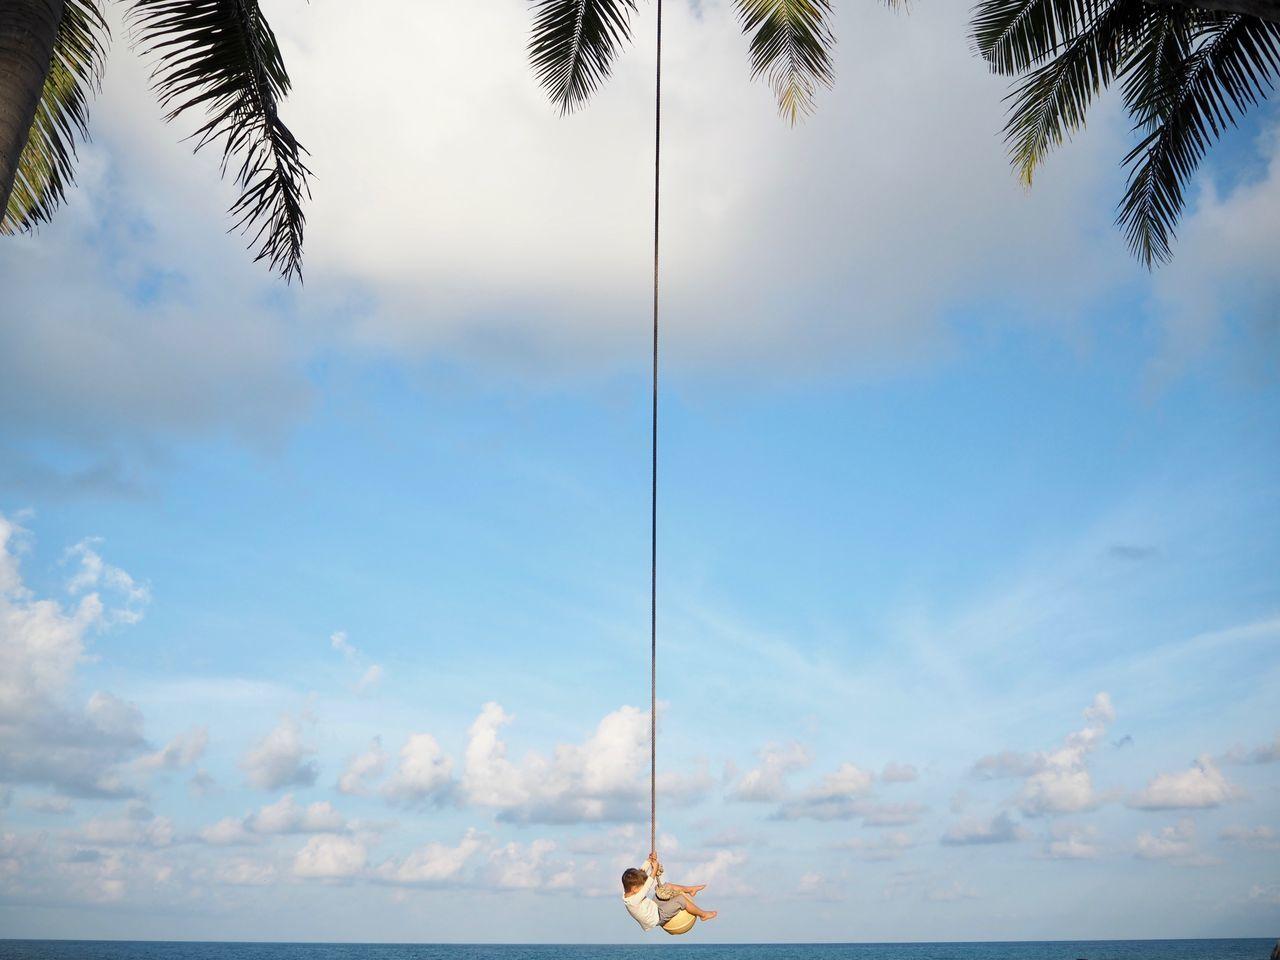 Boy Day Freedom Horizon Horizon Over Water Nature Outdoors Palm Tree Scenics Sea Sky Sunlight Swing Tree The Week On EyeEm The Week On EyeEm The Great Outdoors - 2017 EyeEm Awards Live For The Story Fresh On Market 2017